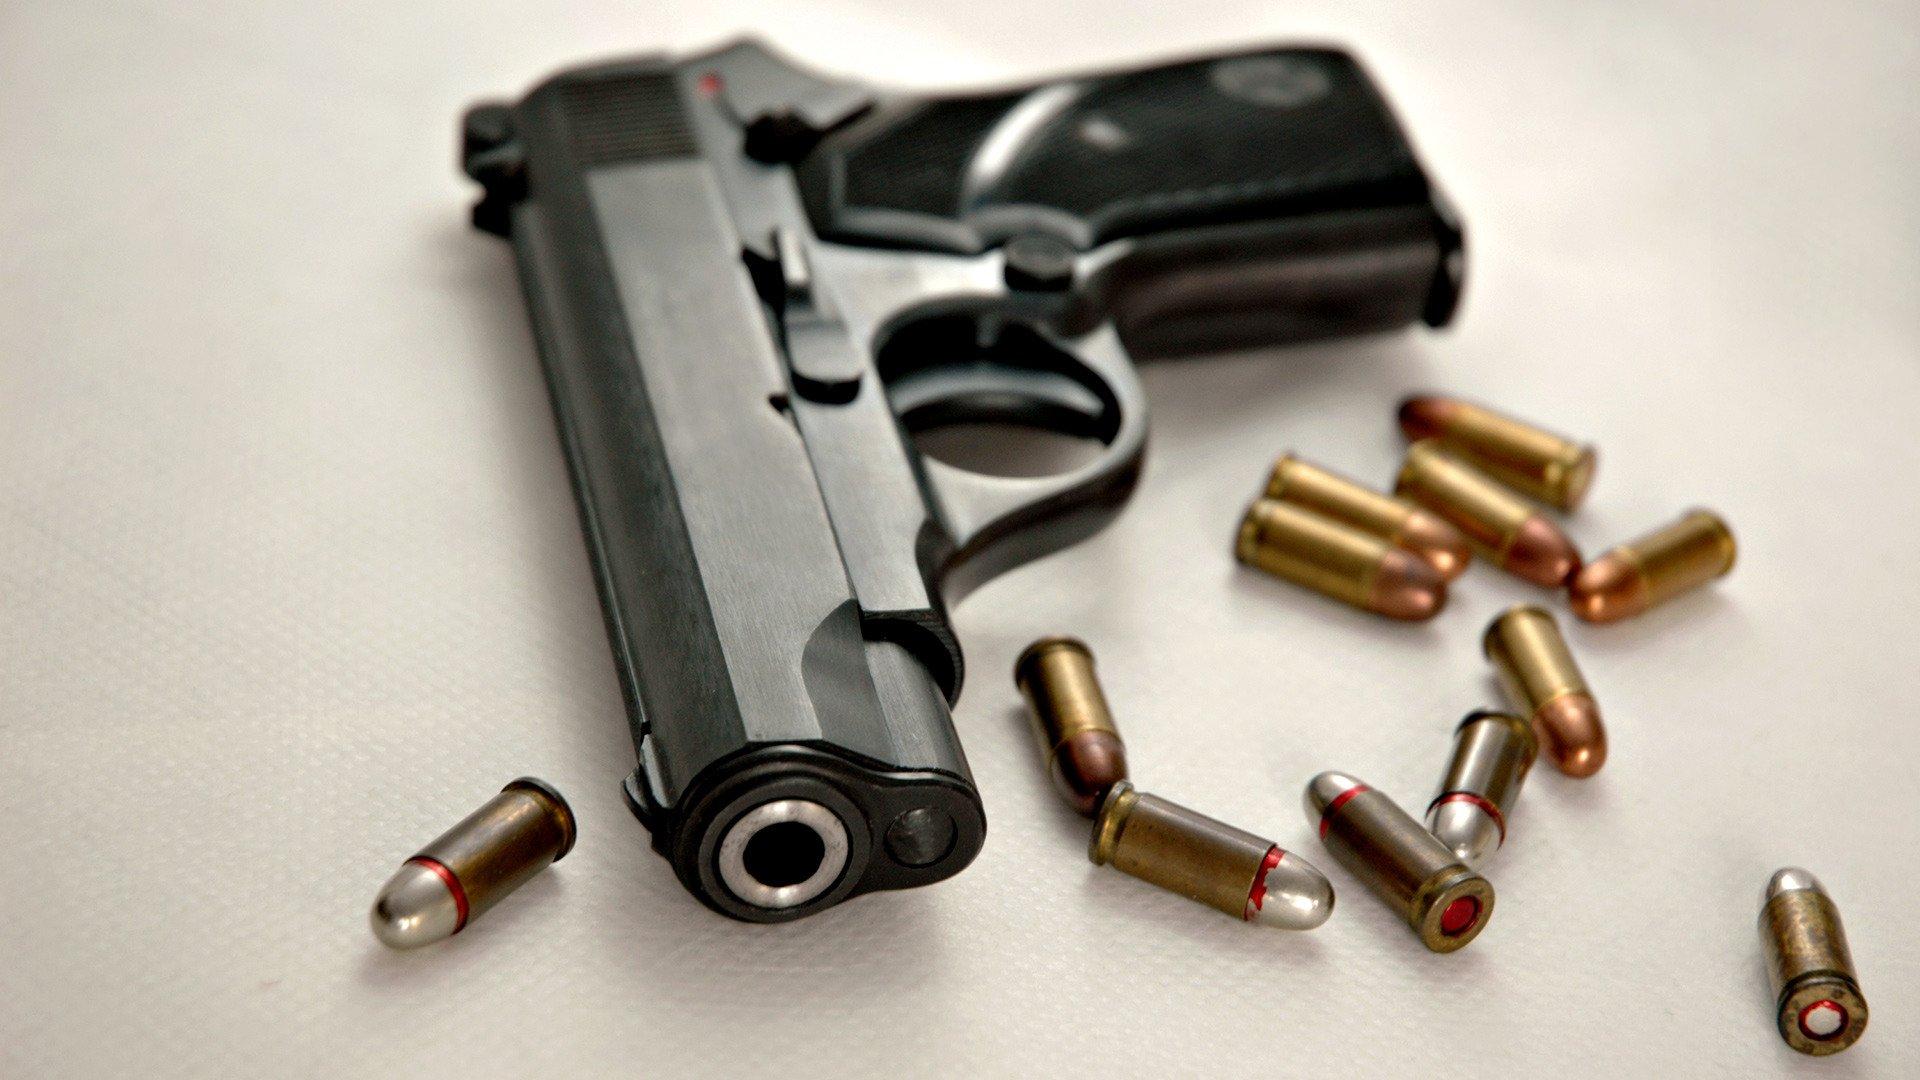 Hd wallpaper gun - Hd Wallpaper Background Id 211347 1920x1080 Weapons Pistol